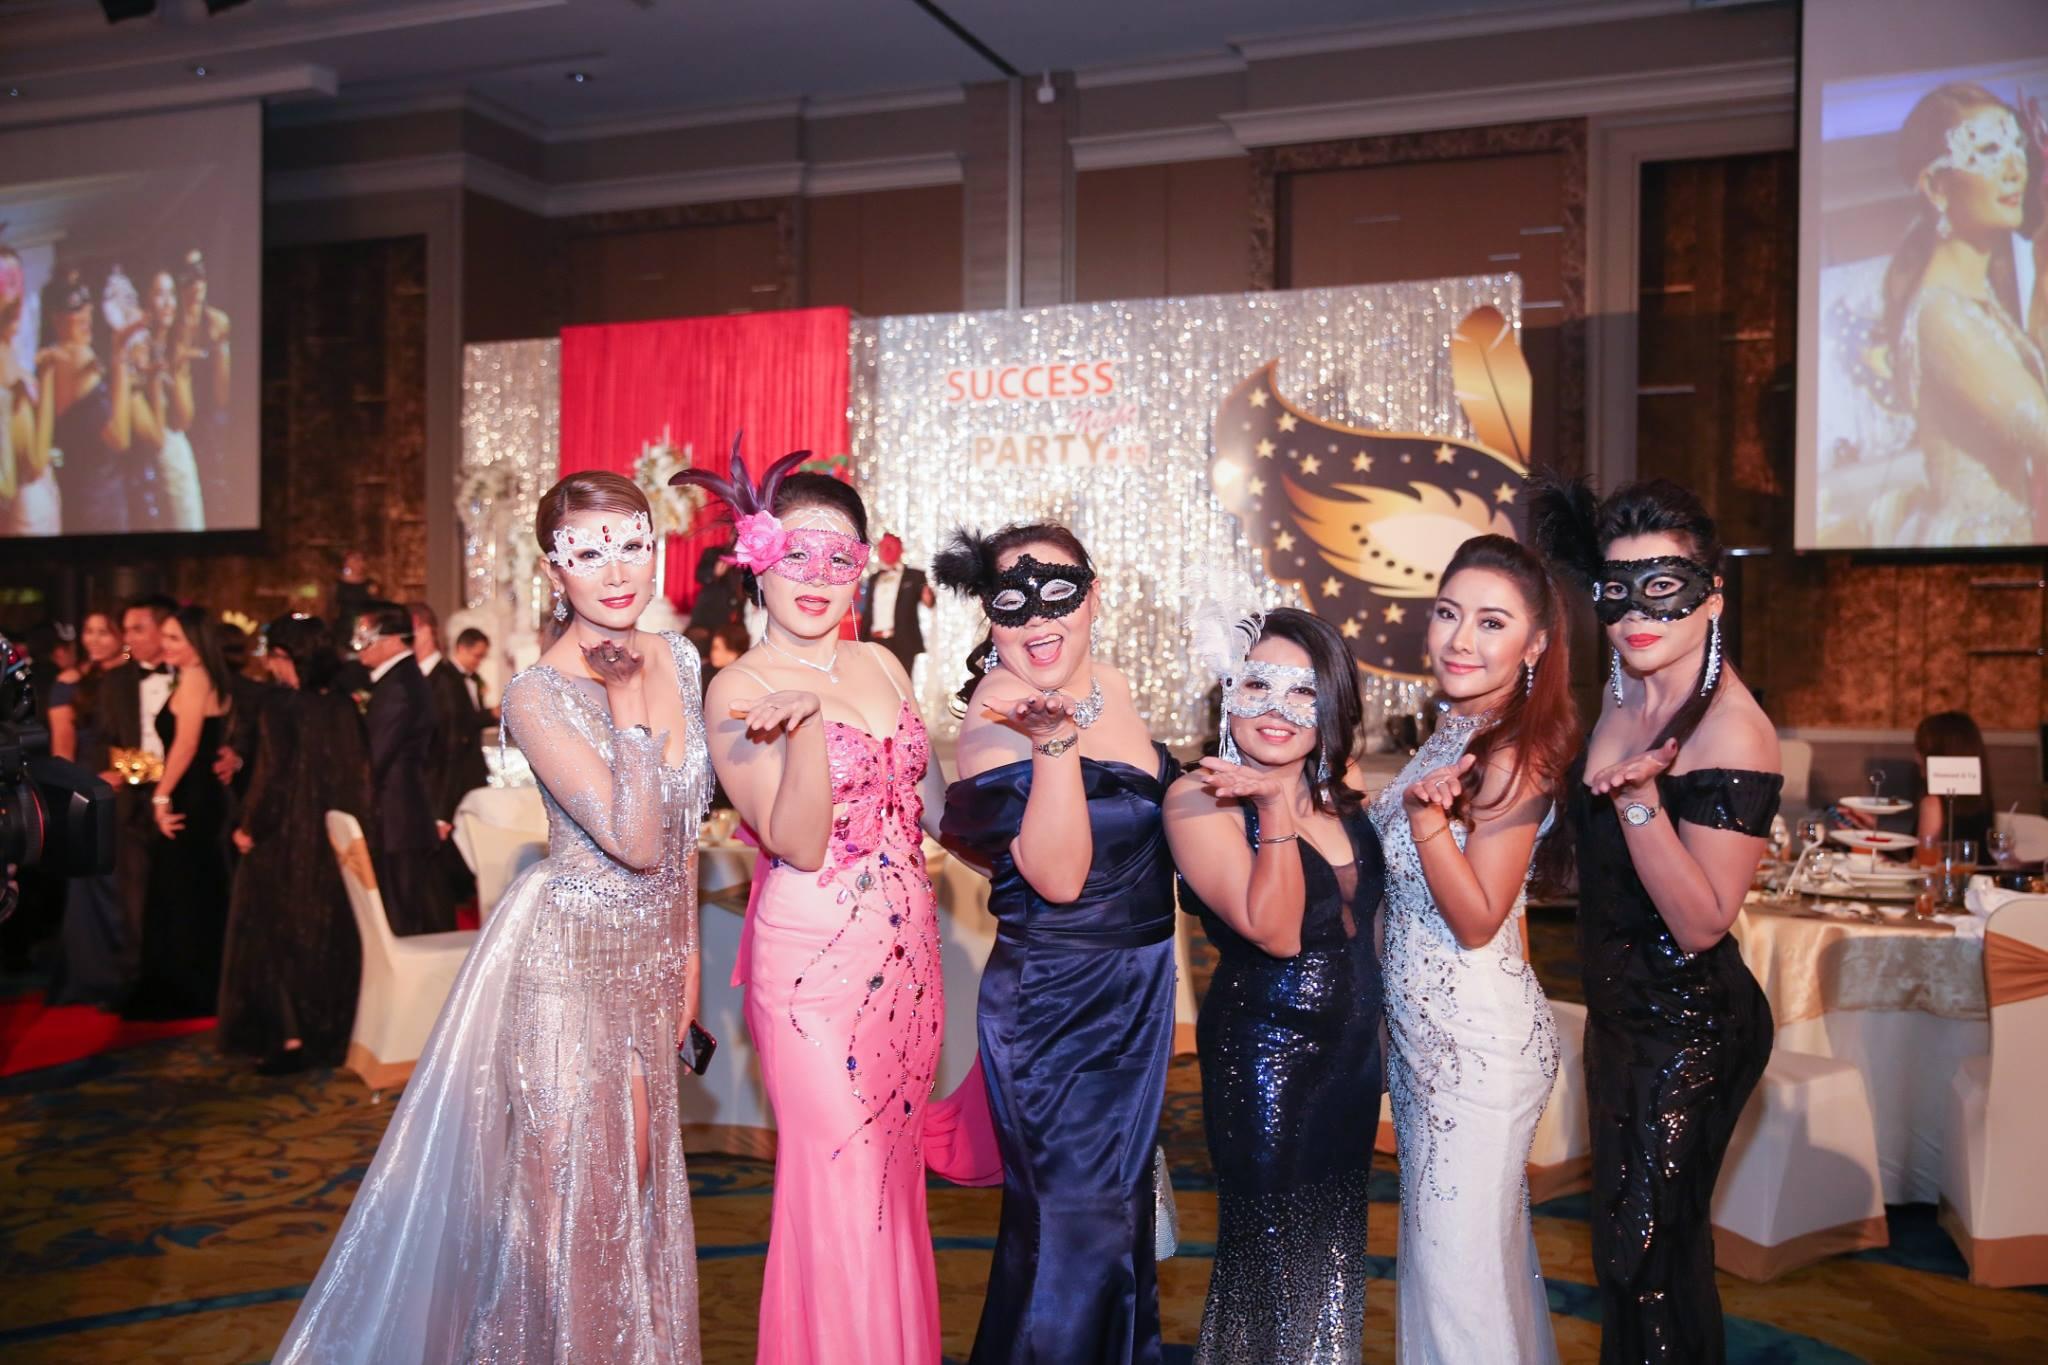 Success Night Party ครั้งที่ 15 (9)